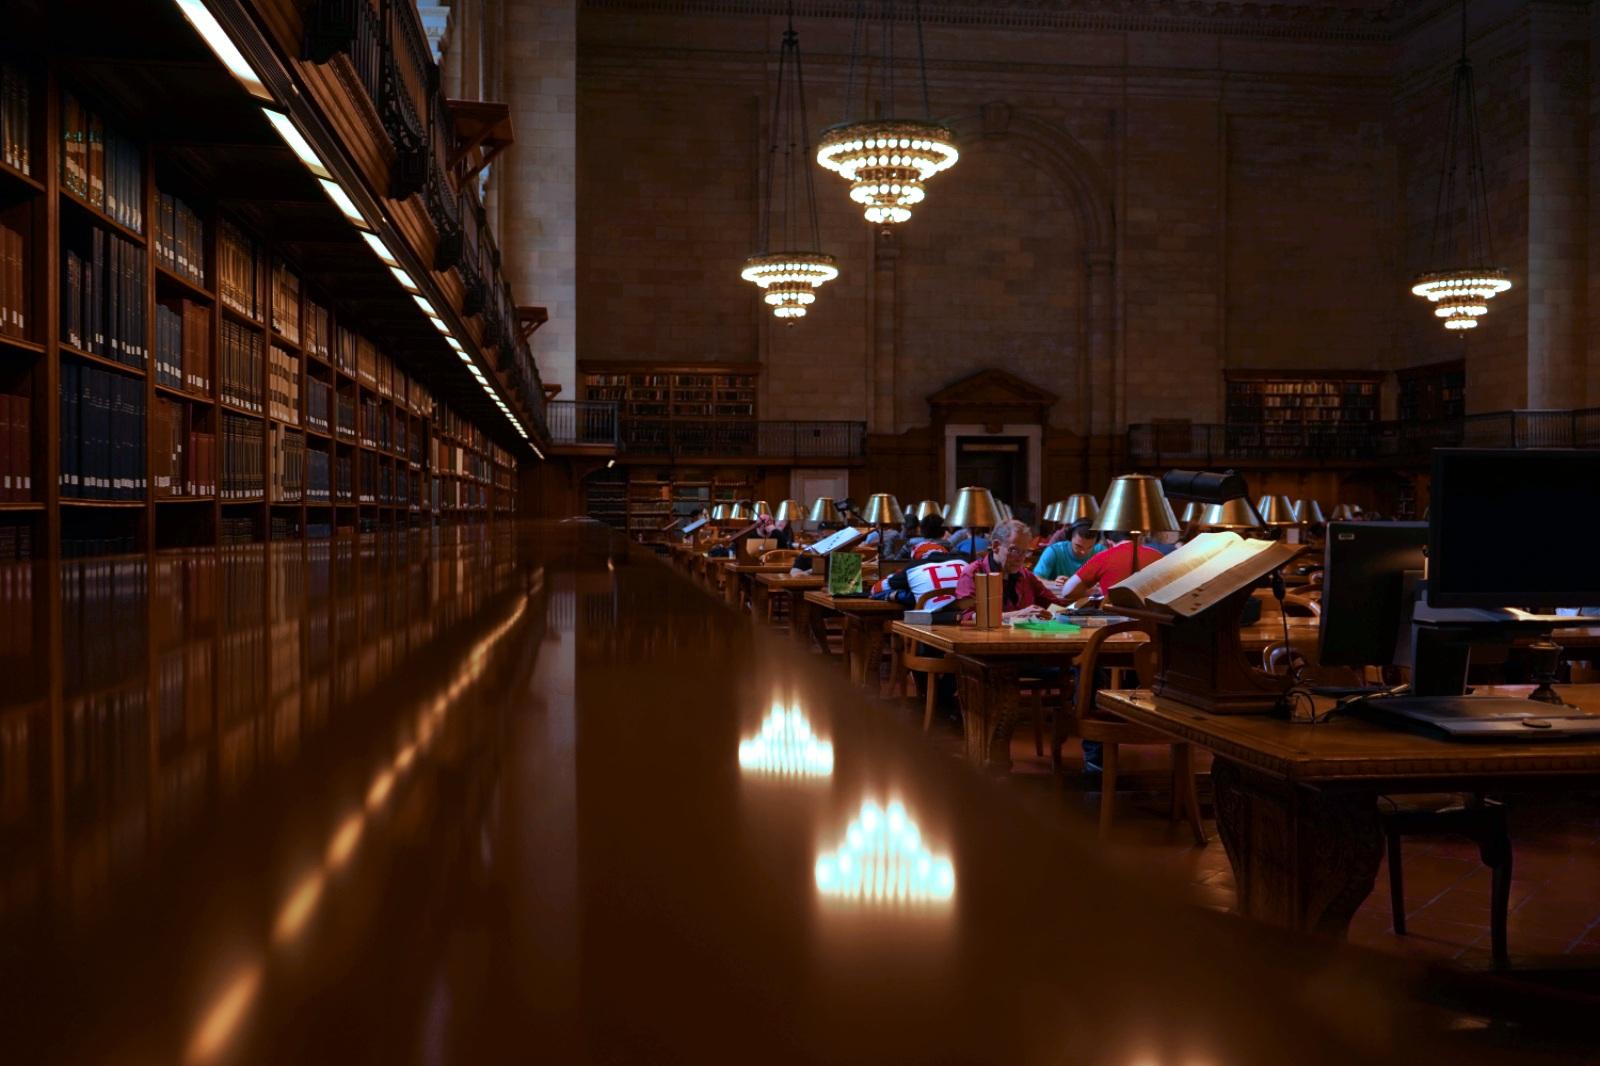 Medzi knihami